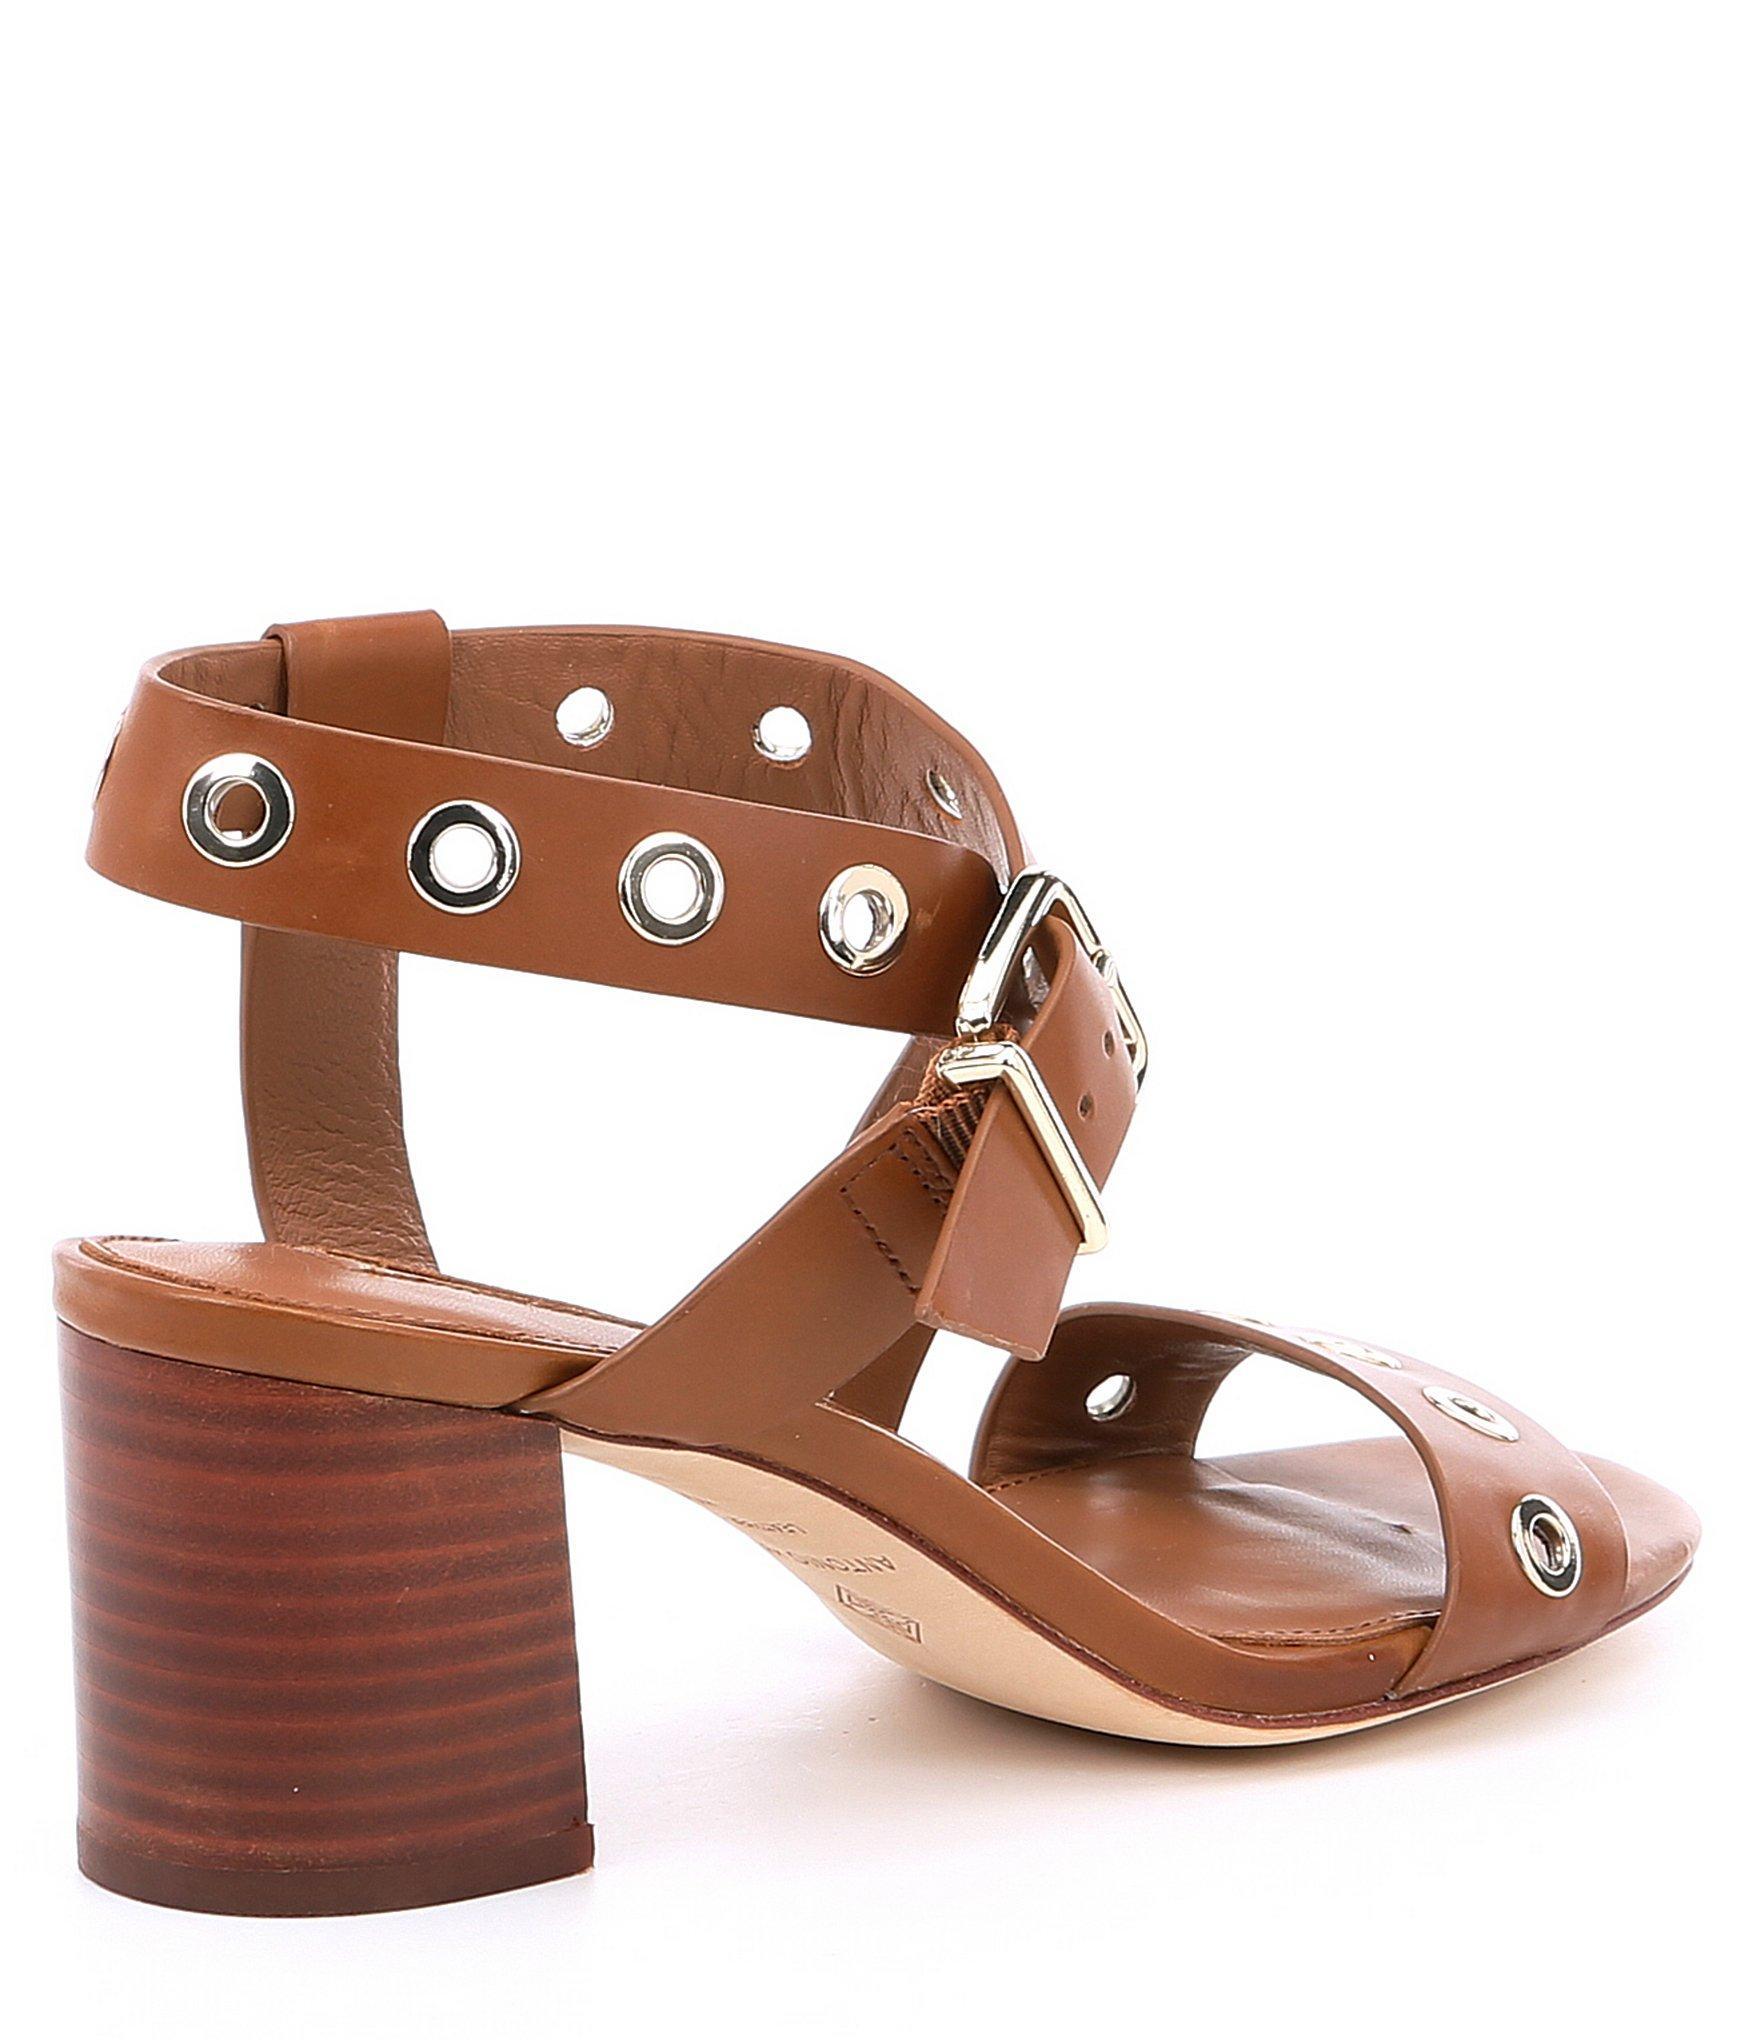 8052e1cfe Antonio Melani - Brown Oleana Leather Block Heel Sandals - Lyst. View  fullscreen